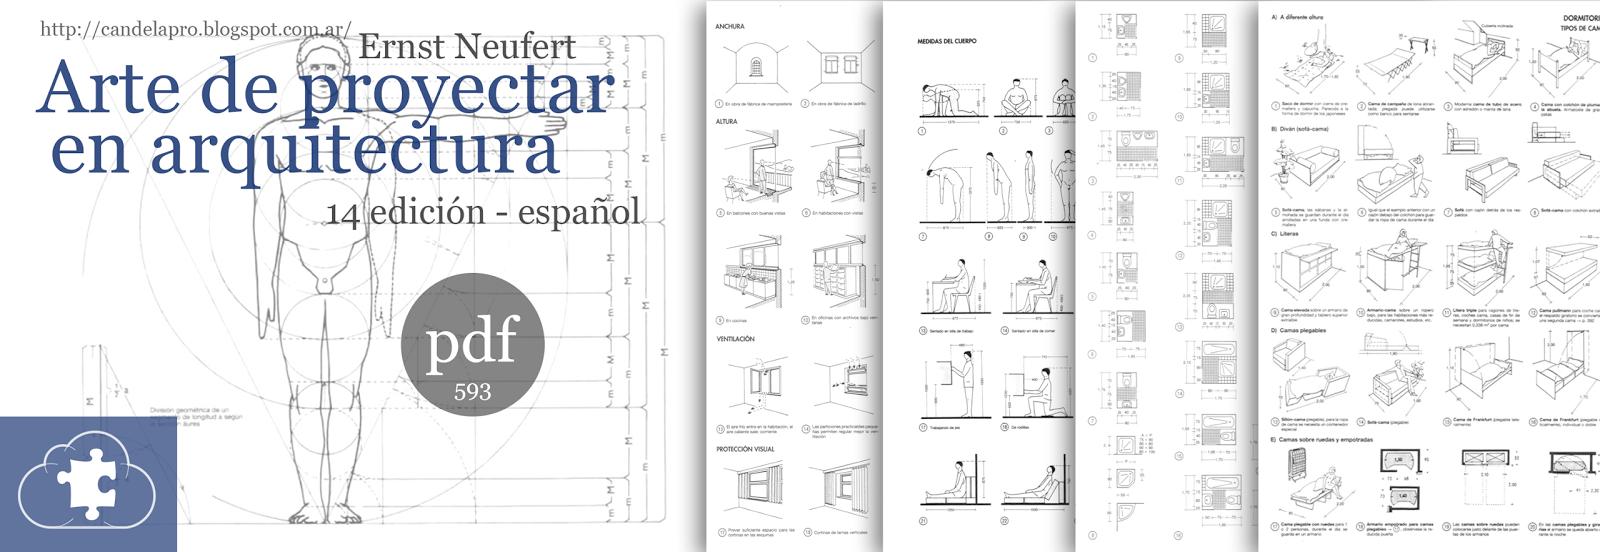 Neufert arte de proyectar en arquitectura espa ol for Planos de arquitectura pdf